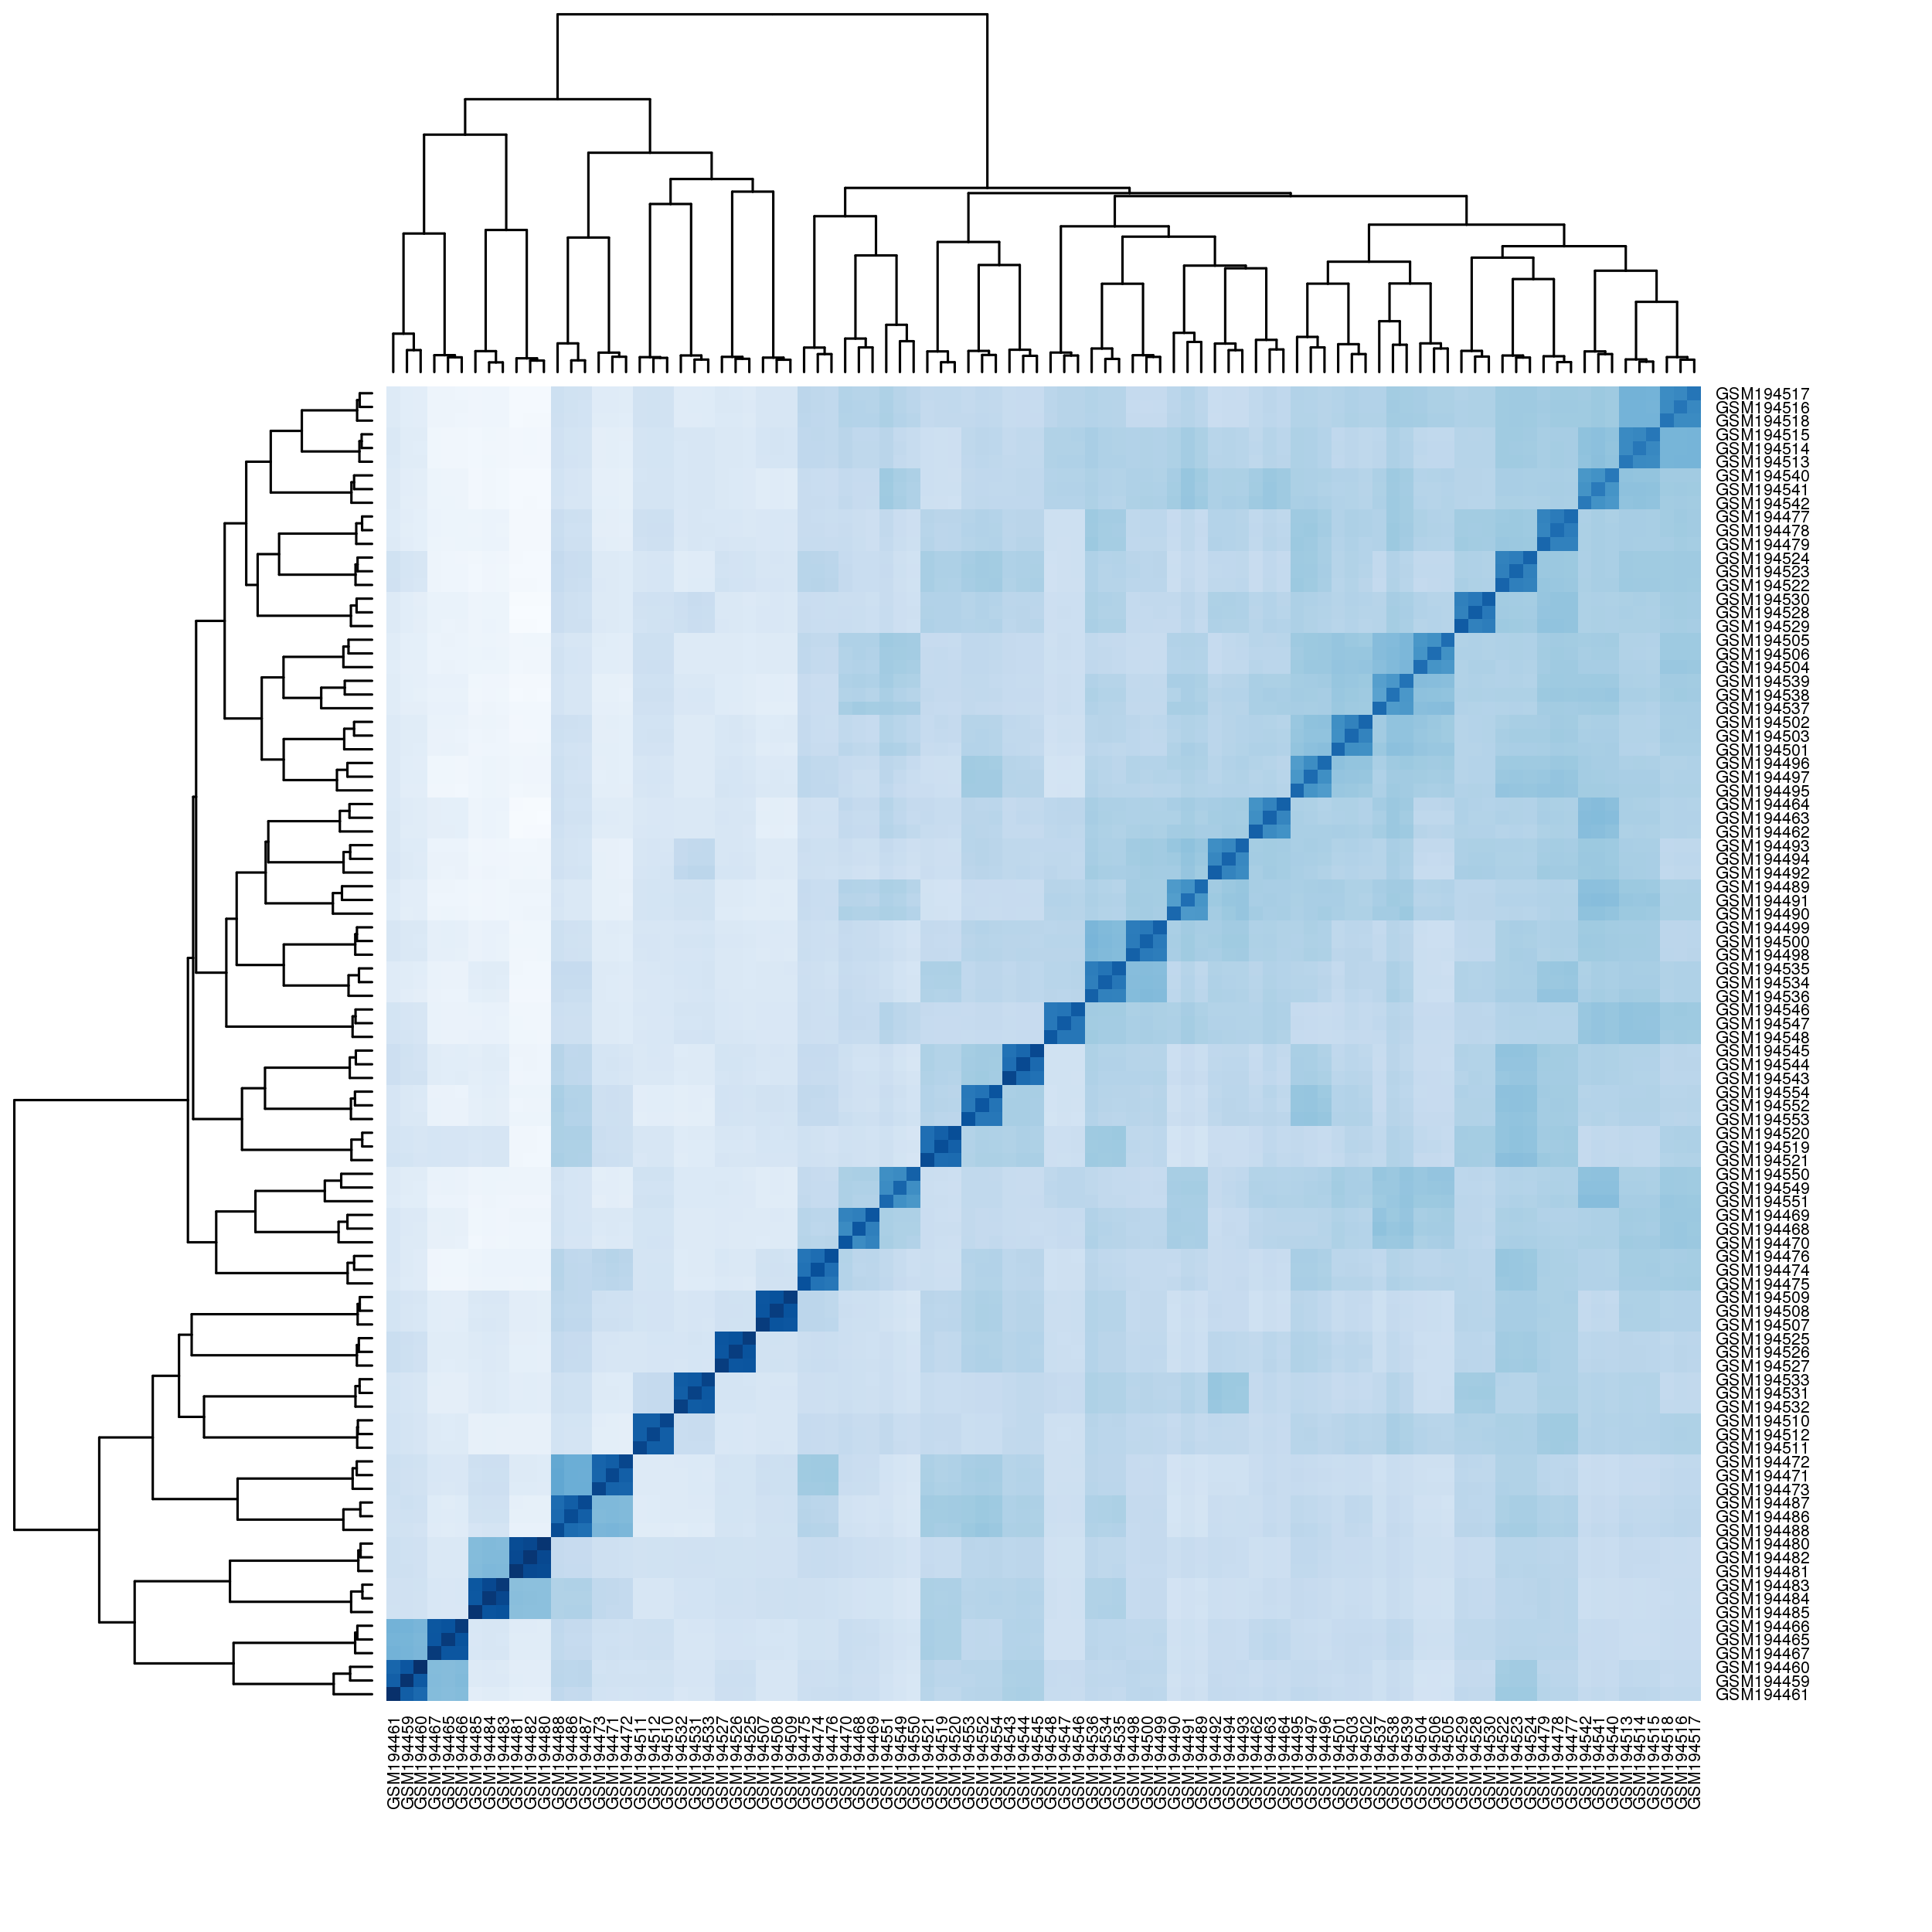 Distribution Matrix